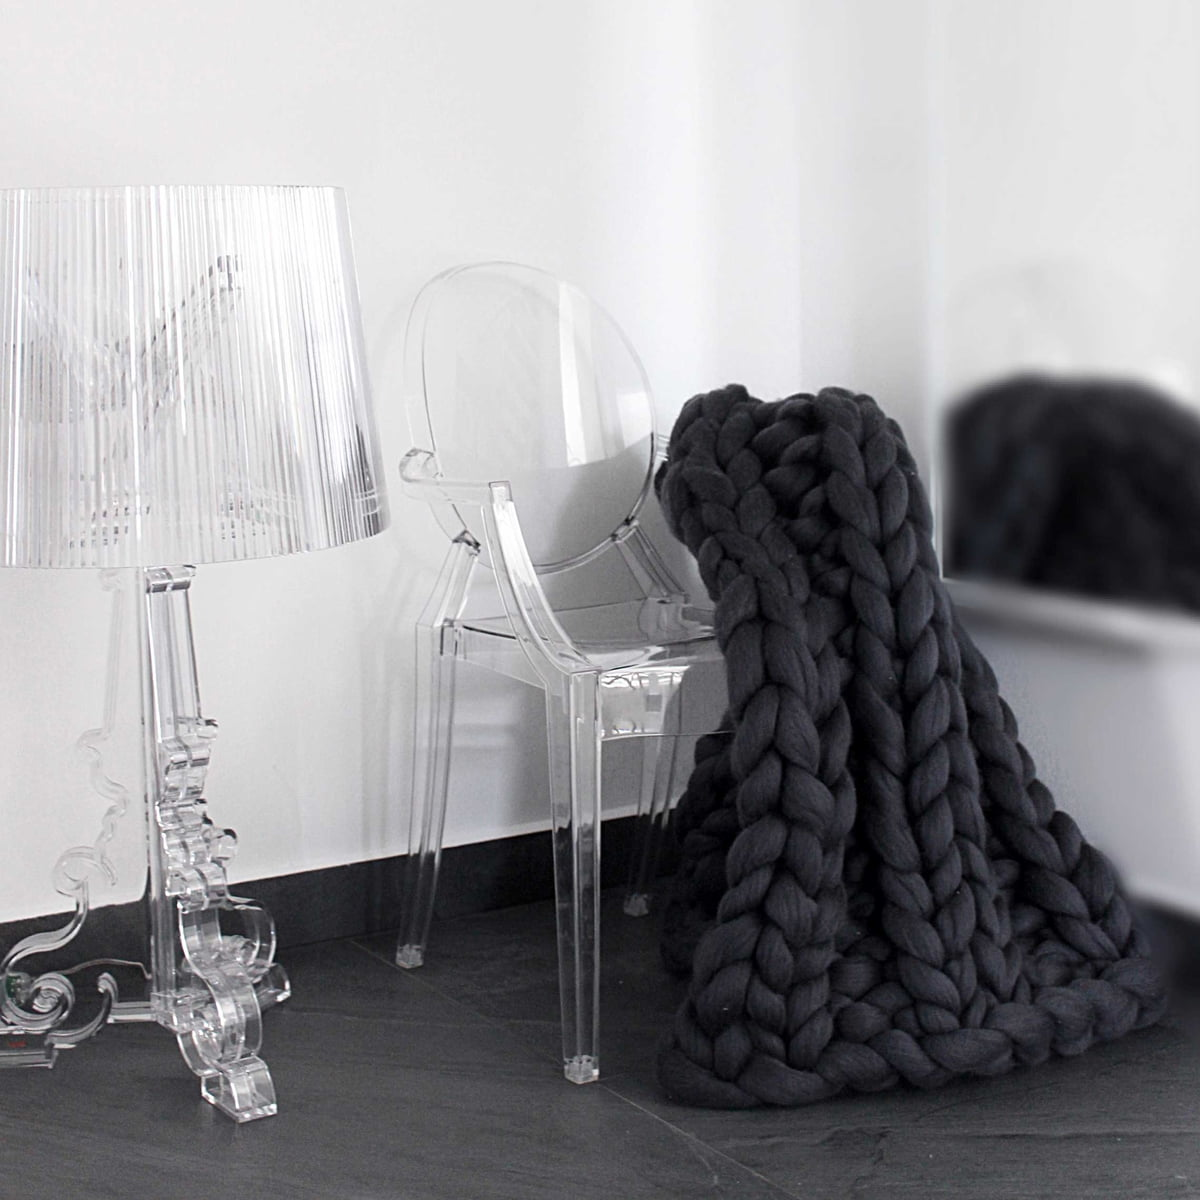 Peachy Kartell Louis Ghost Crystal Clear Camellatalisay Diy Chair Ideas Camellatalisaycom